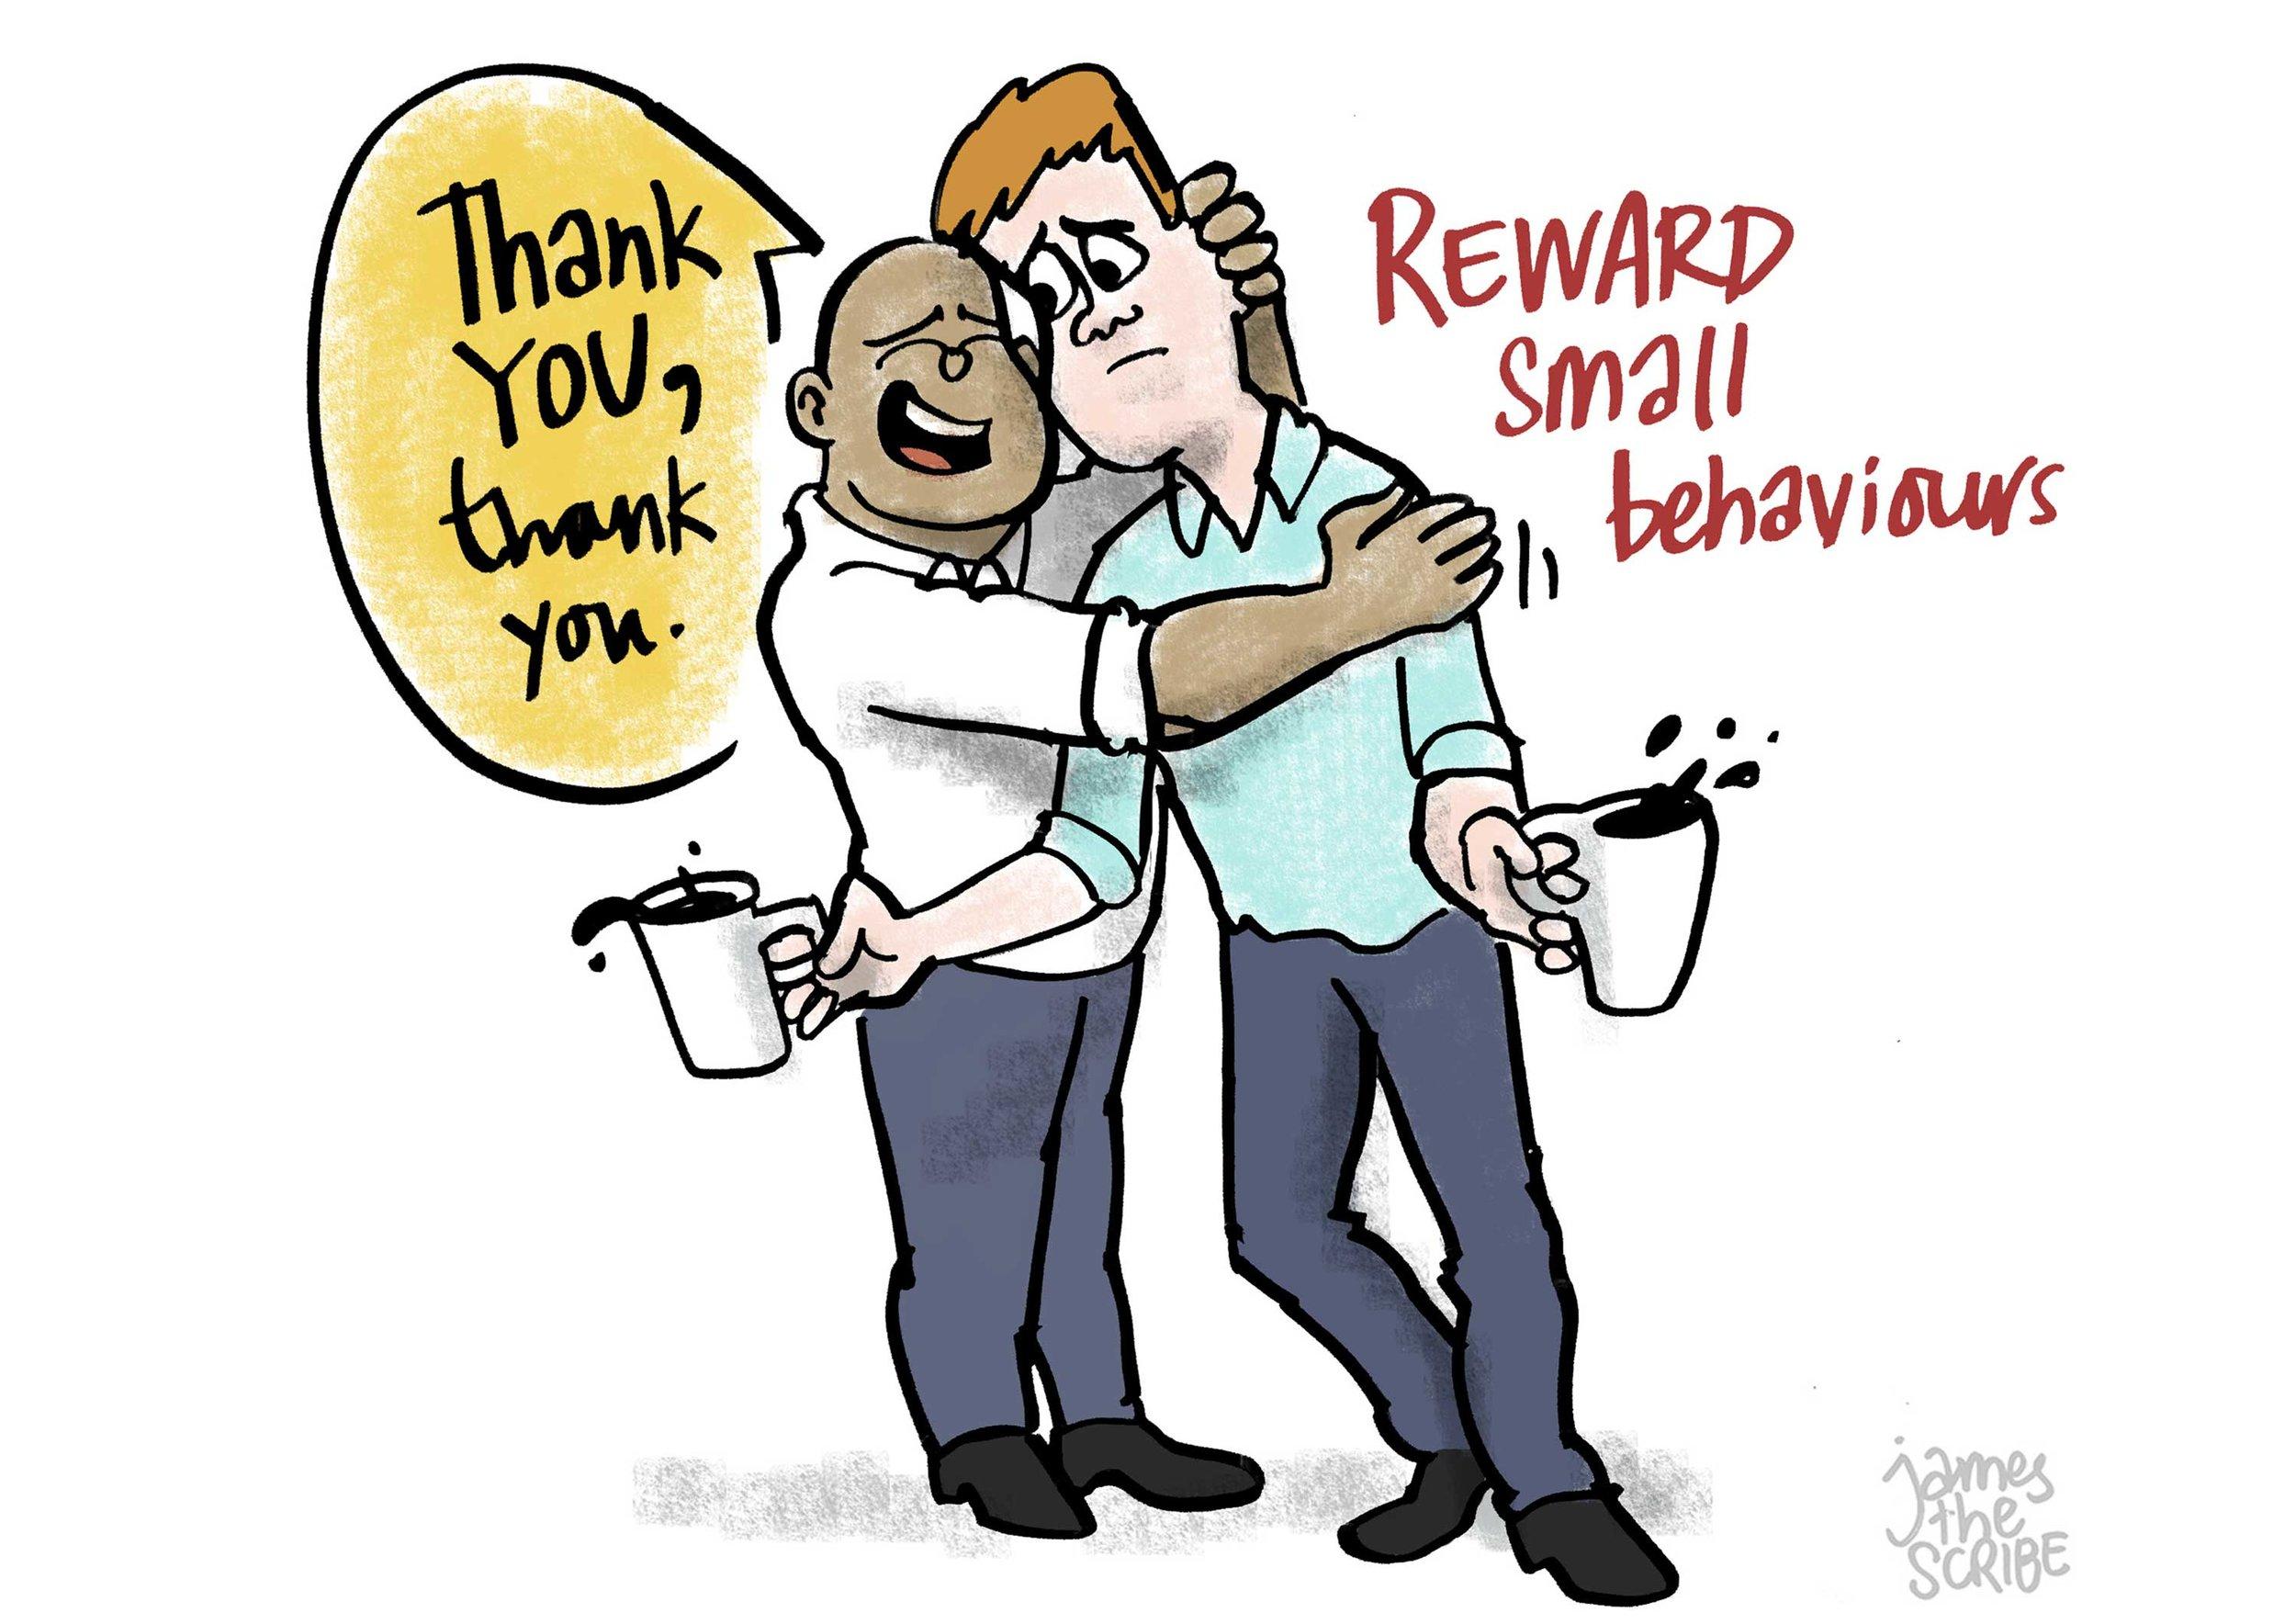 reward-small-behaviours.jpg